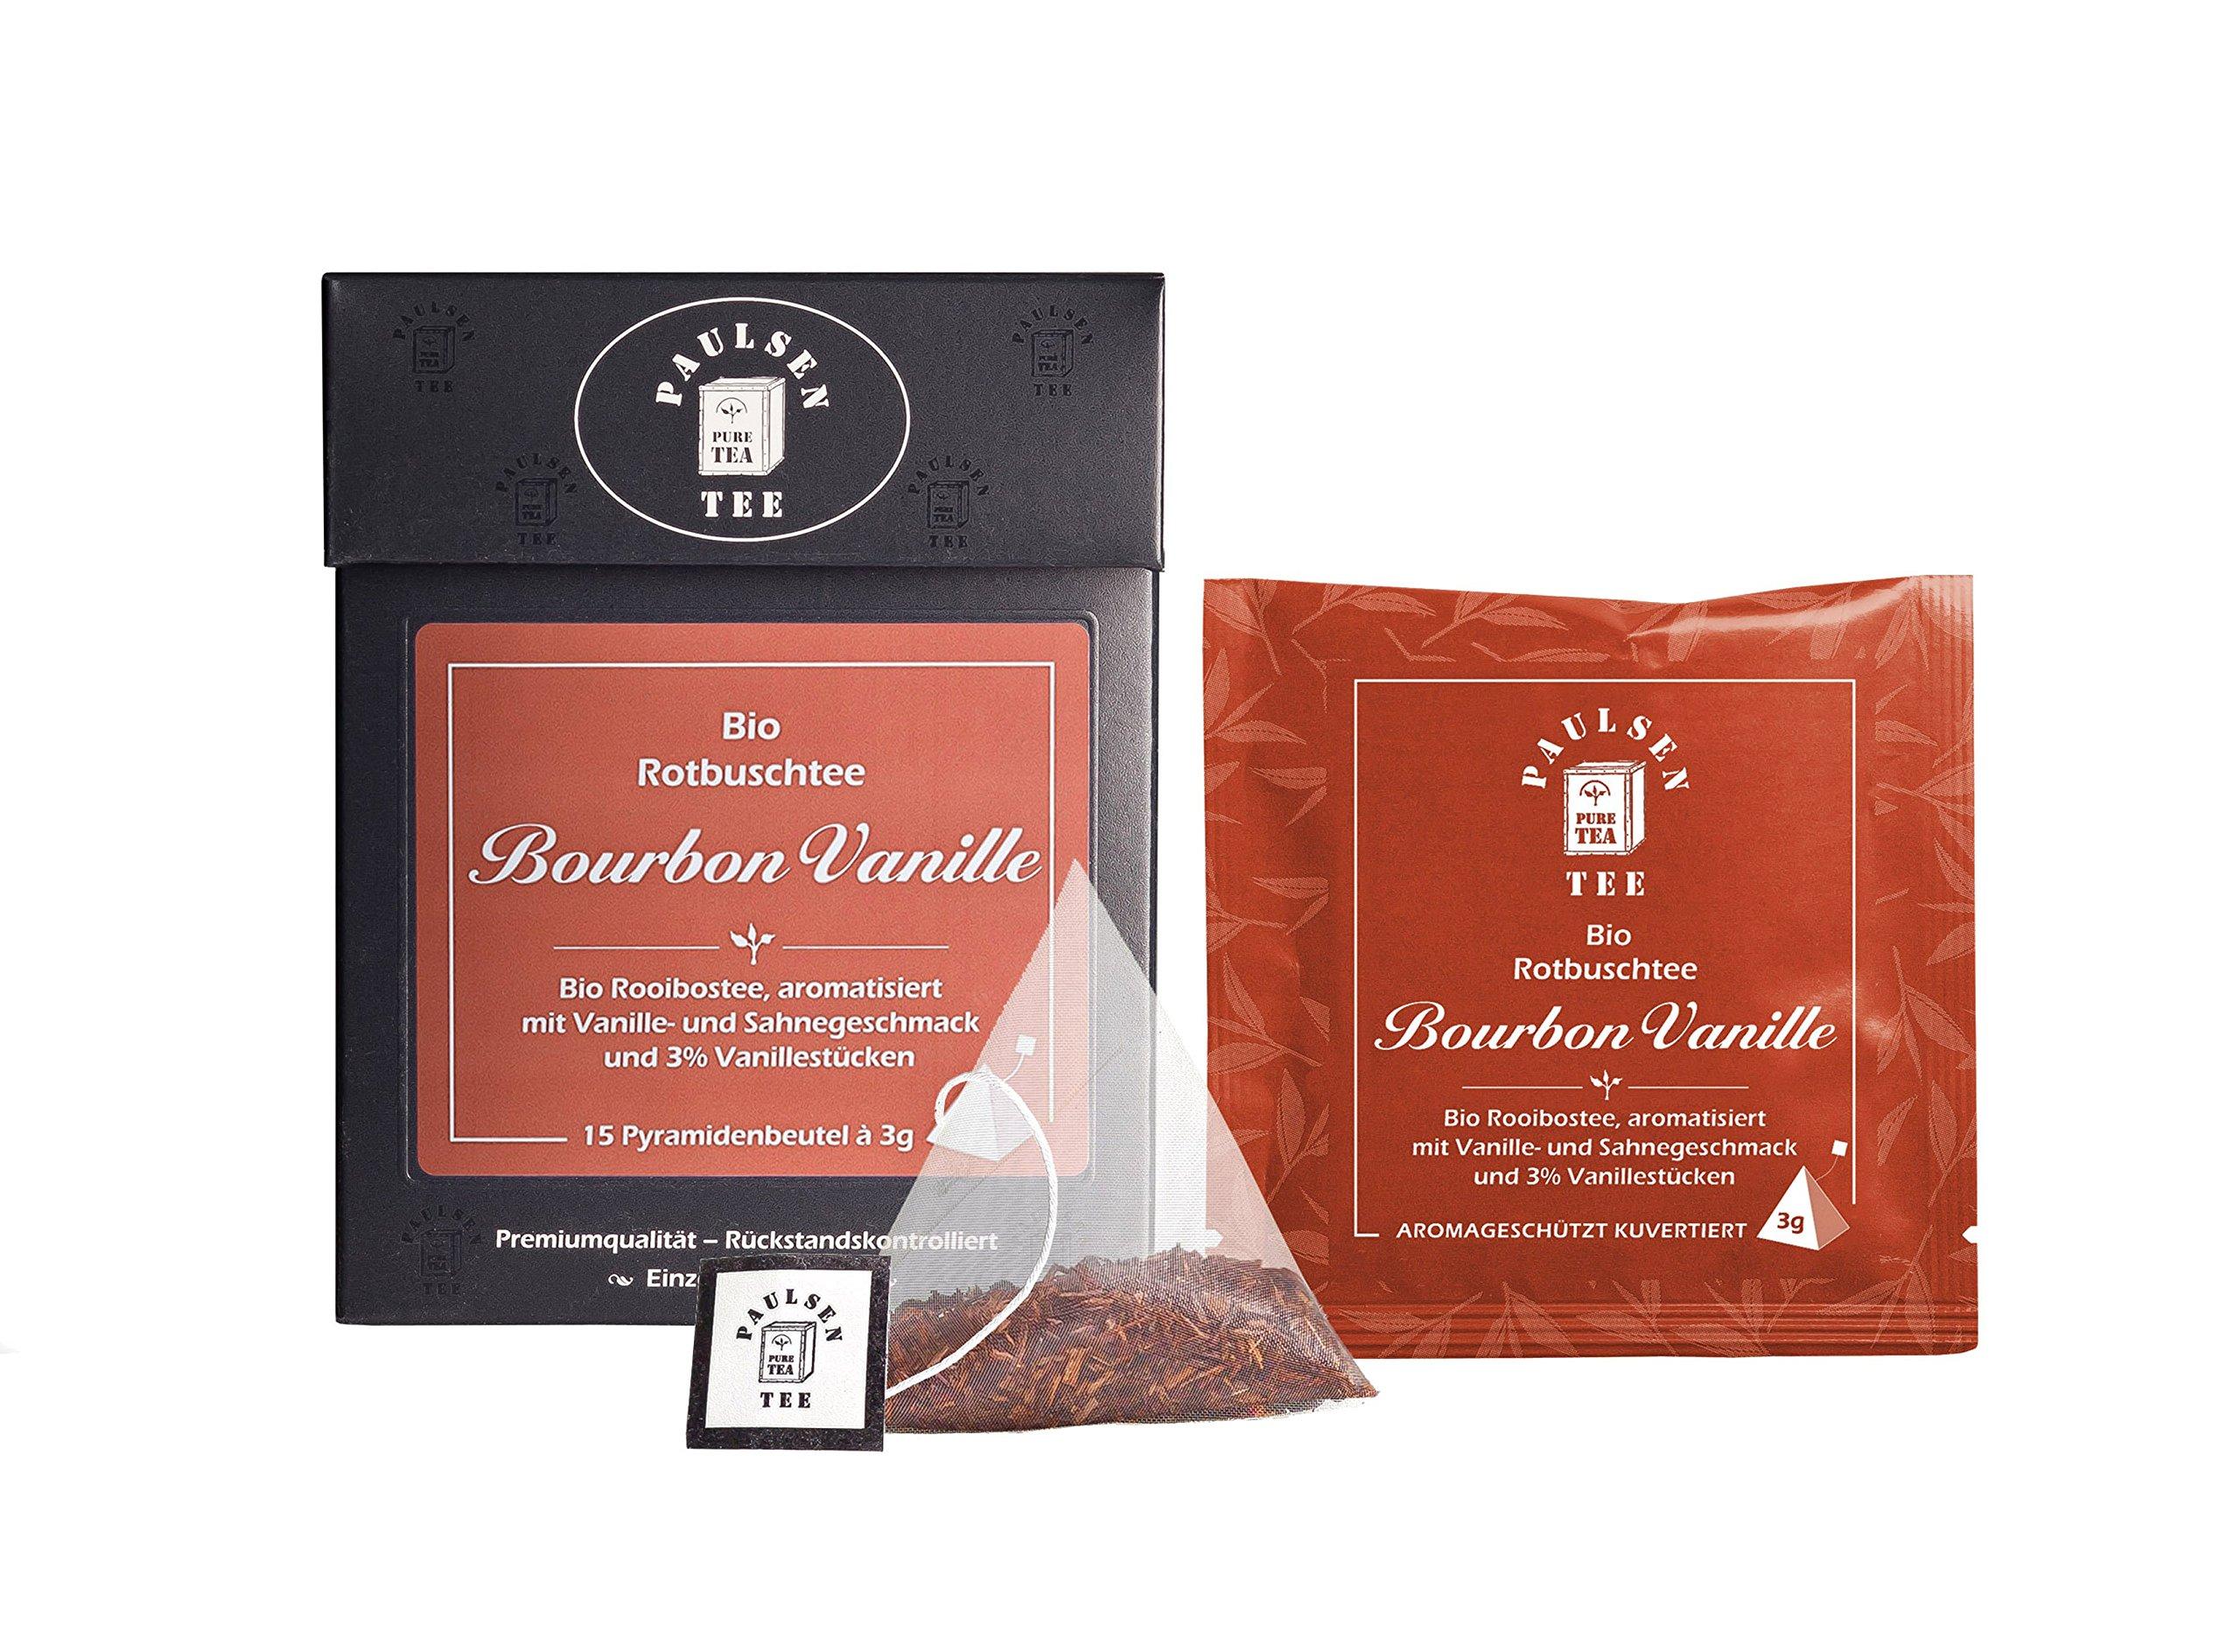 Paulsen-Tee-Pyramidenbeutel-Bourbon-Vanille-Rotbuschtee-15-x-3g-Bio